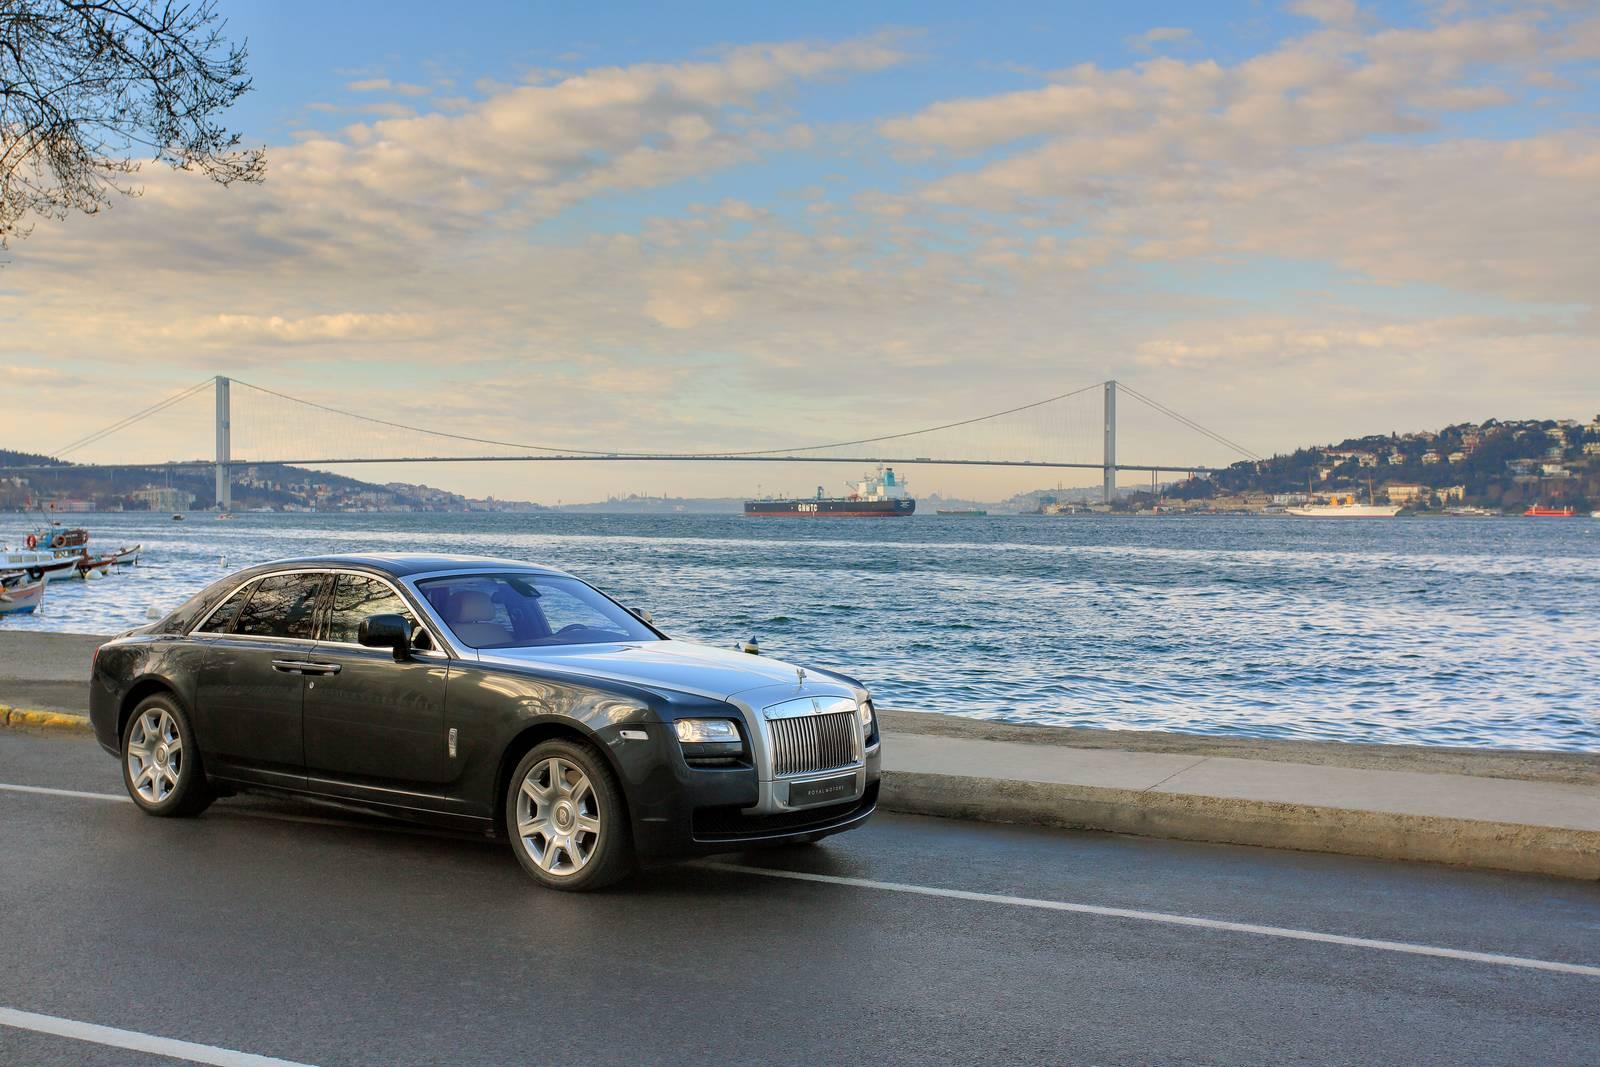 Rolls royce motor cars opens new turkish dealership gtspirit for Rolls royce motor cars